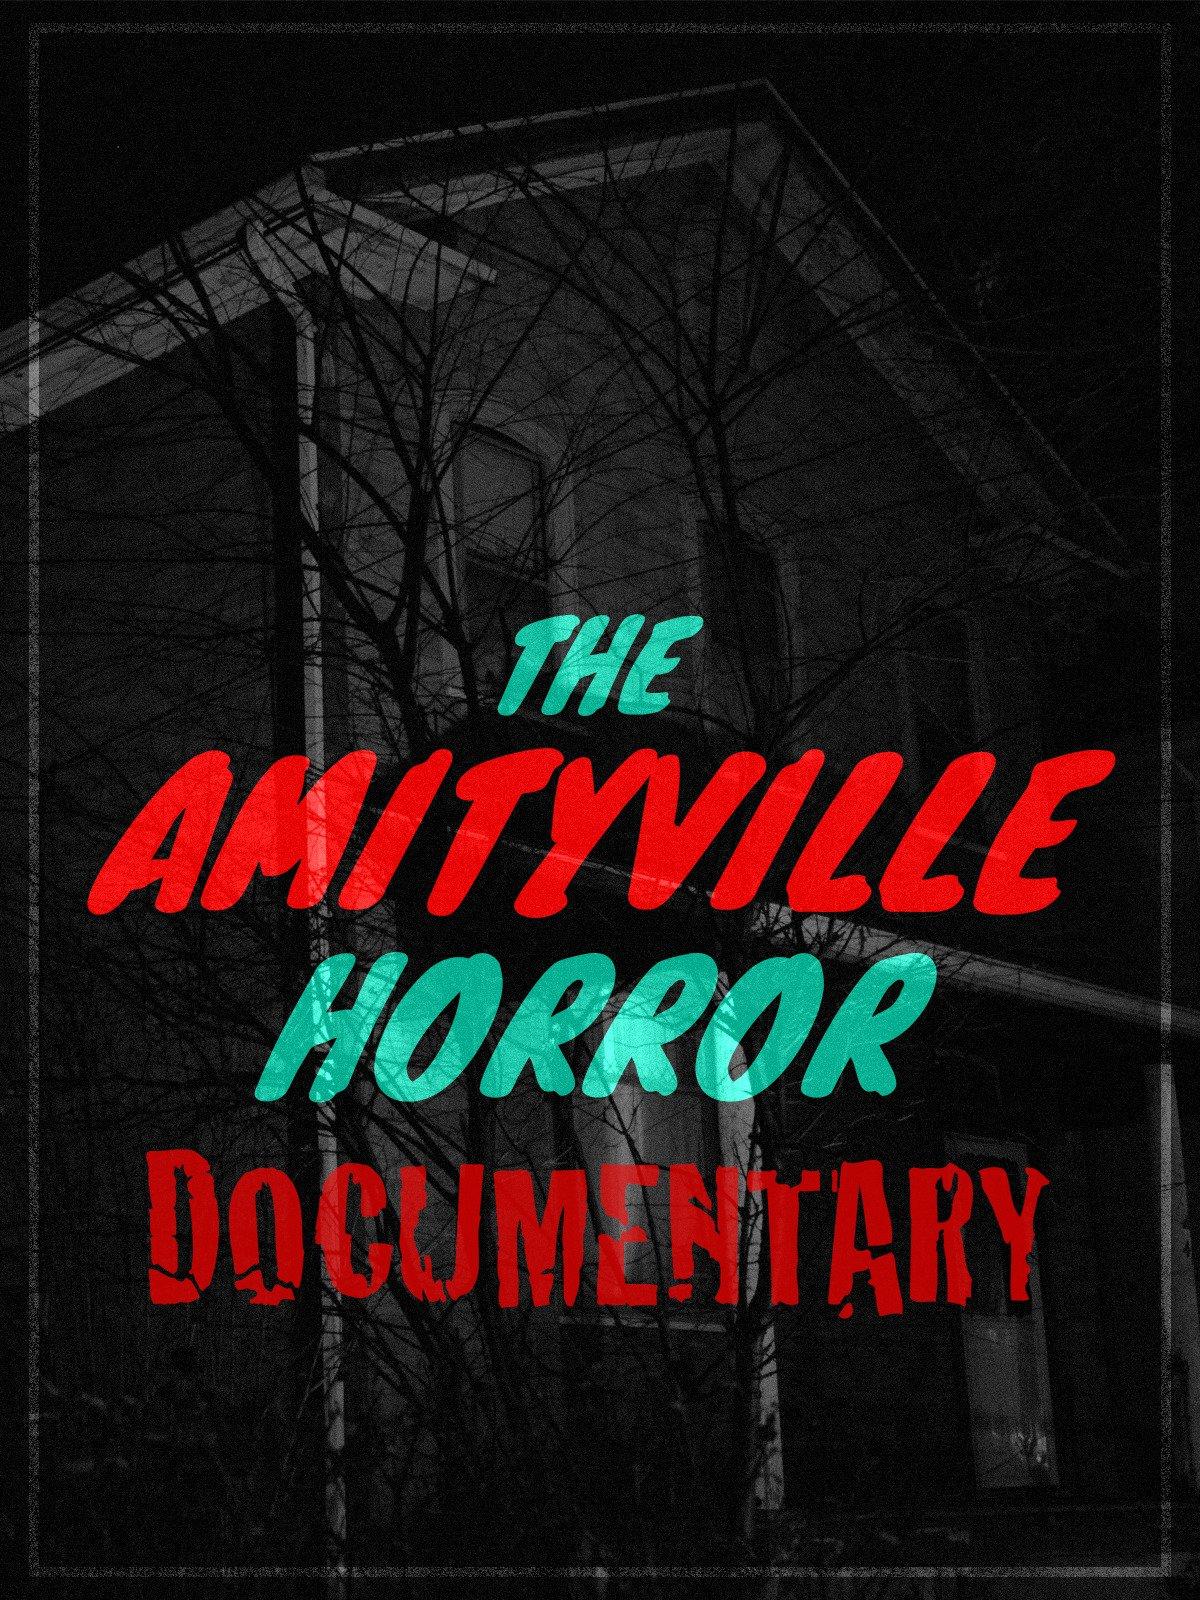 The Amityville Horror Documentary